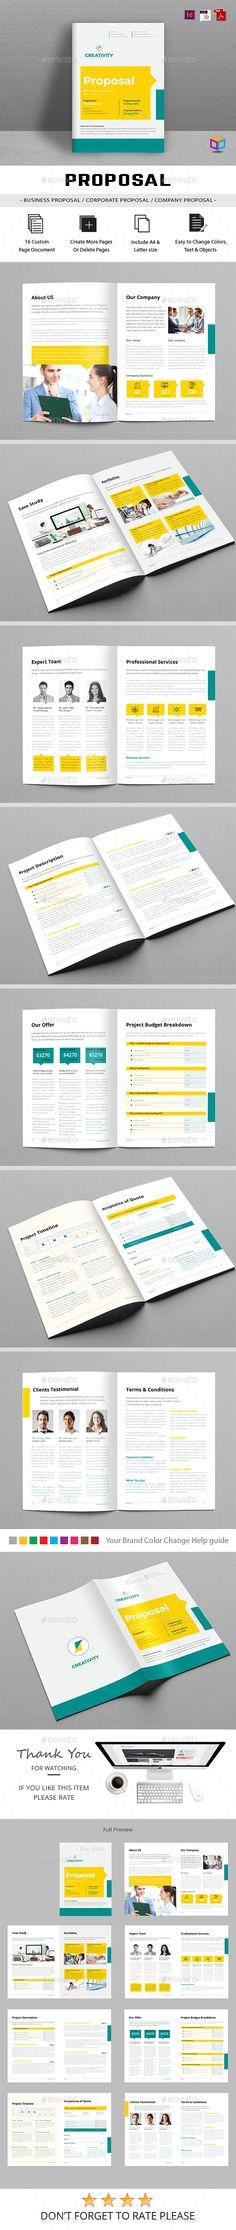 Proposal Template InDesign INDD. Download here: https://graphicriver.net/item/proposals/17416514?ref=ksioks